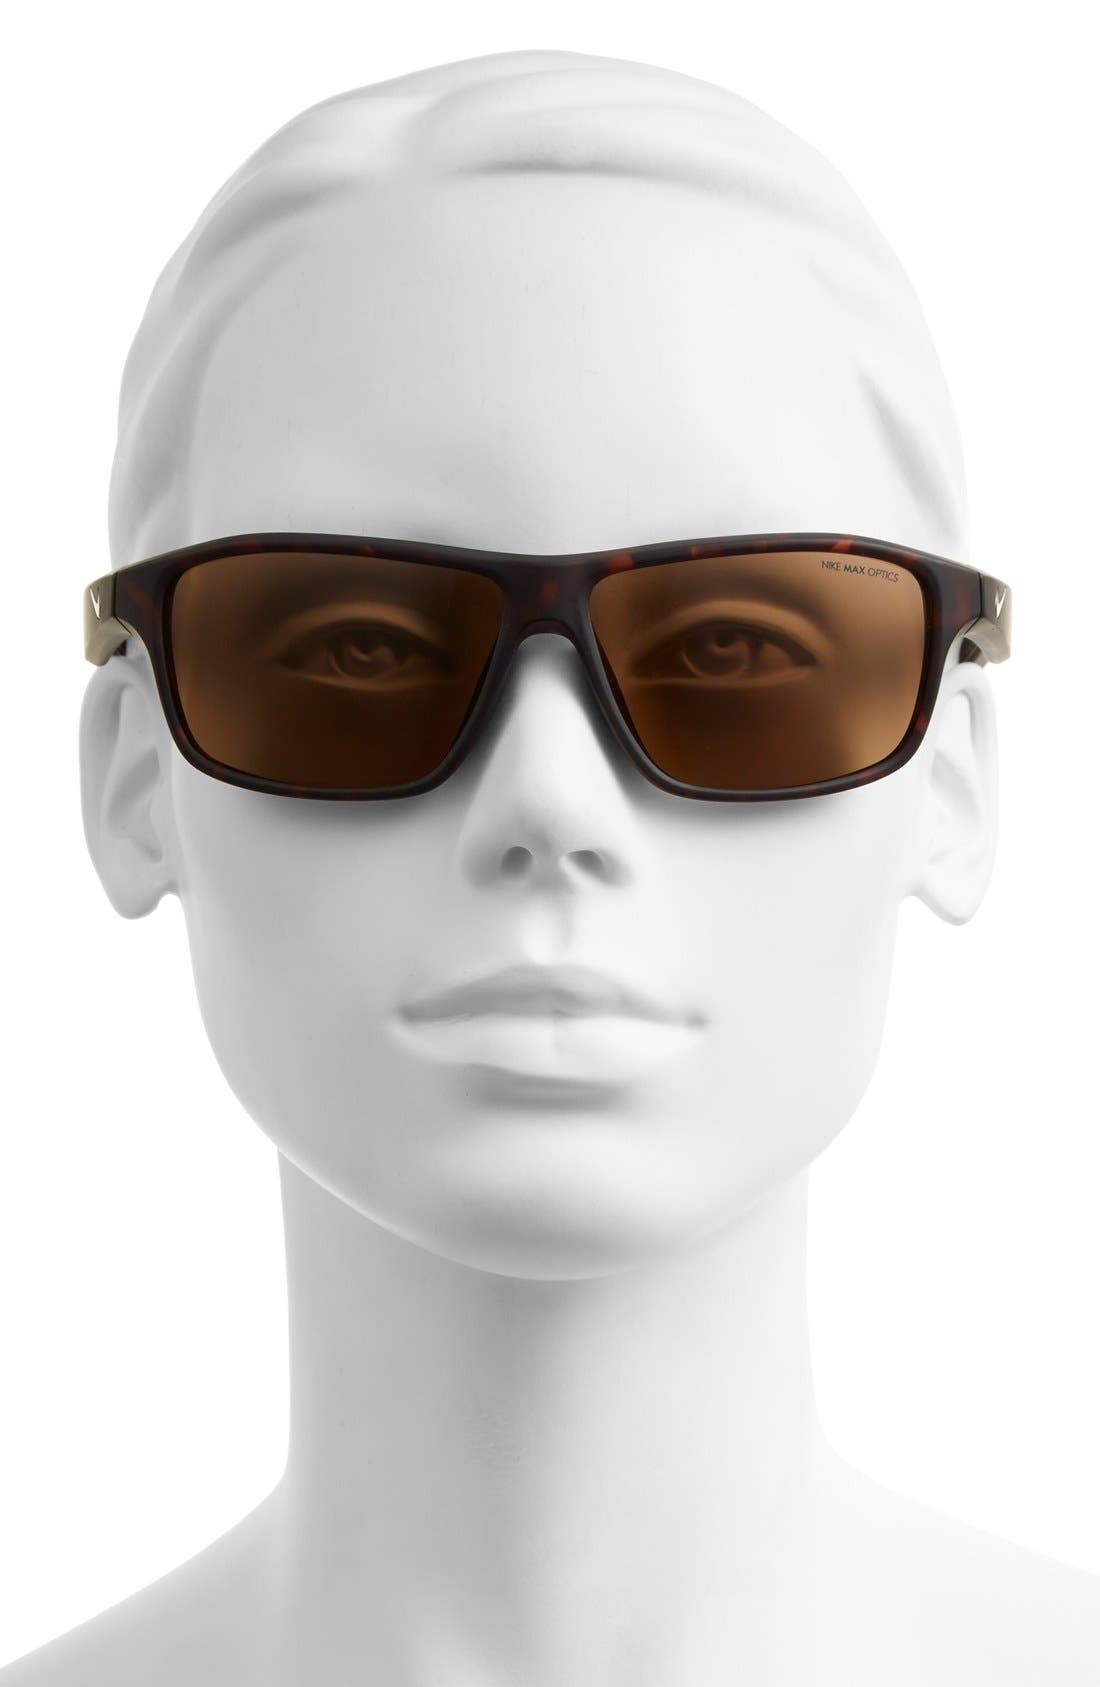 59mm 'Premier 6.0' Performance Sunglasses,                             Alternate thumbnail 2, color,                             MATTE TORTOISE